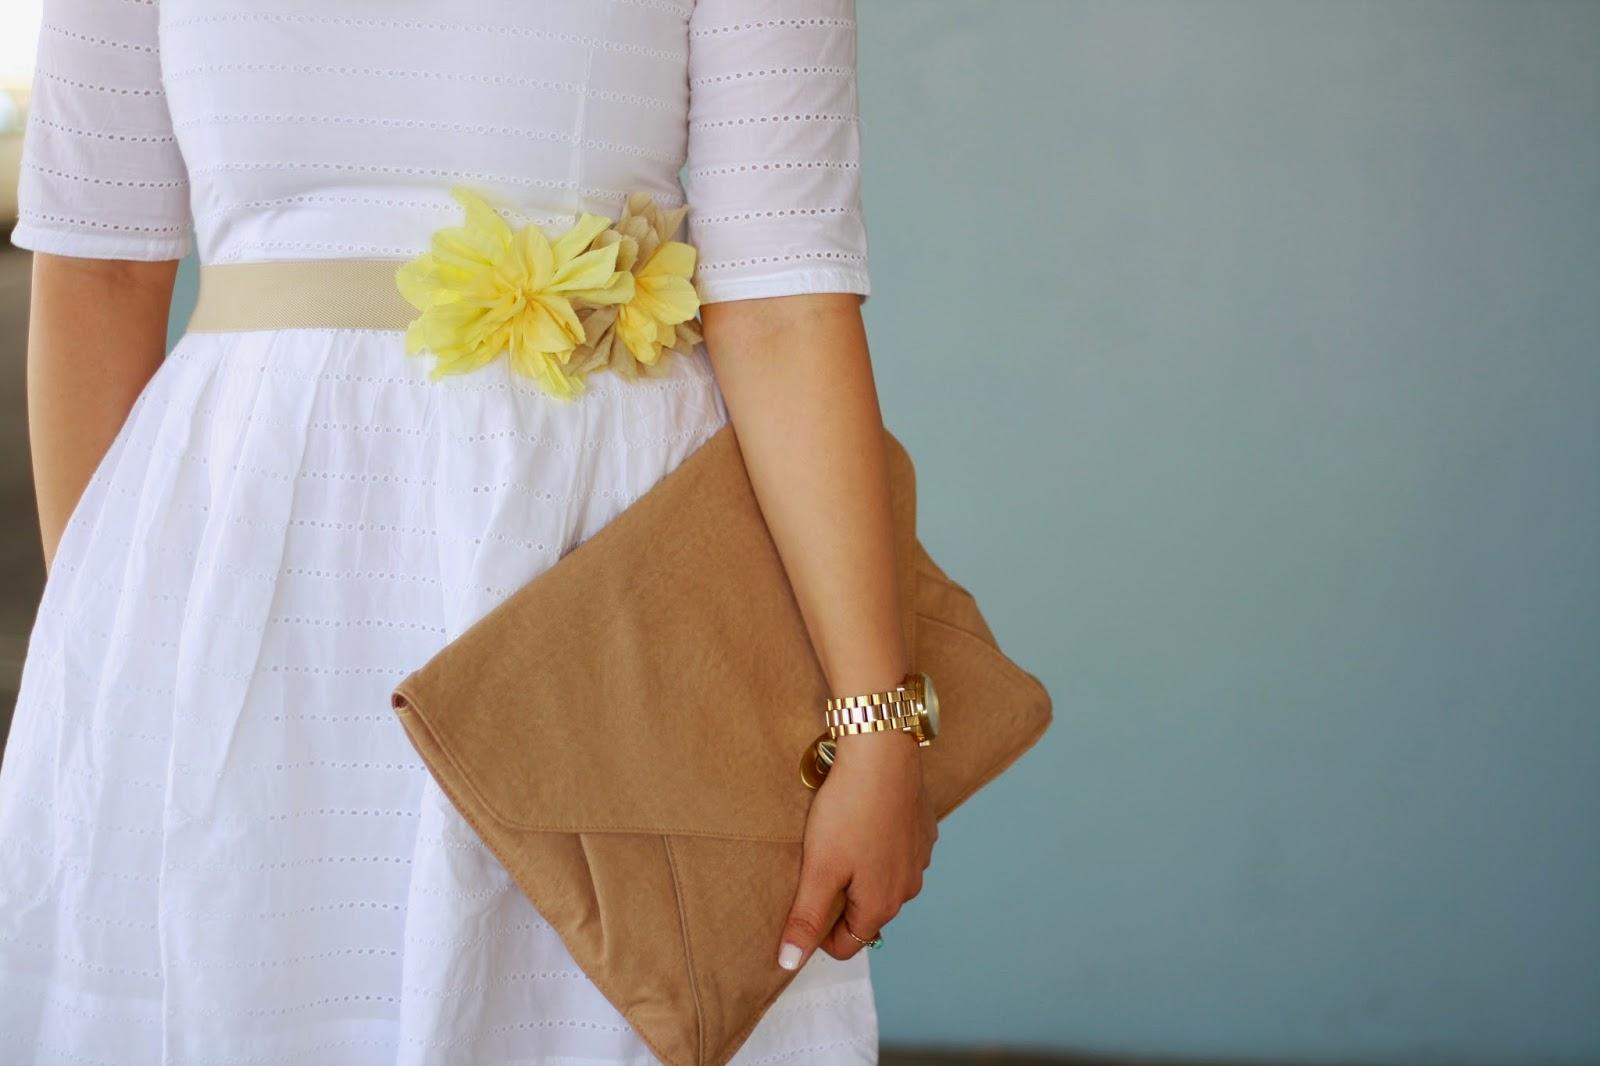 simplyxclassic, white dress, gap, zara, mommy blogger, orange county, lwd